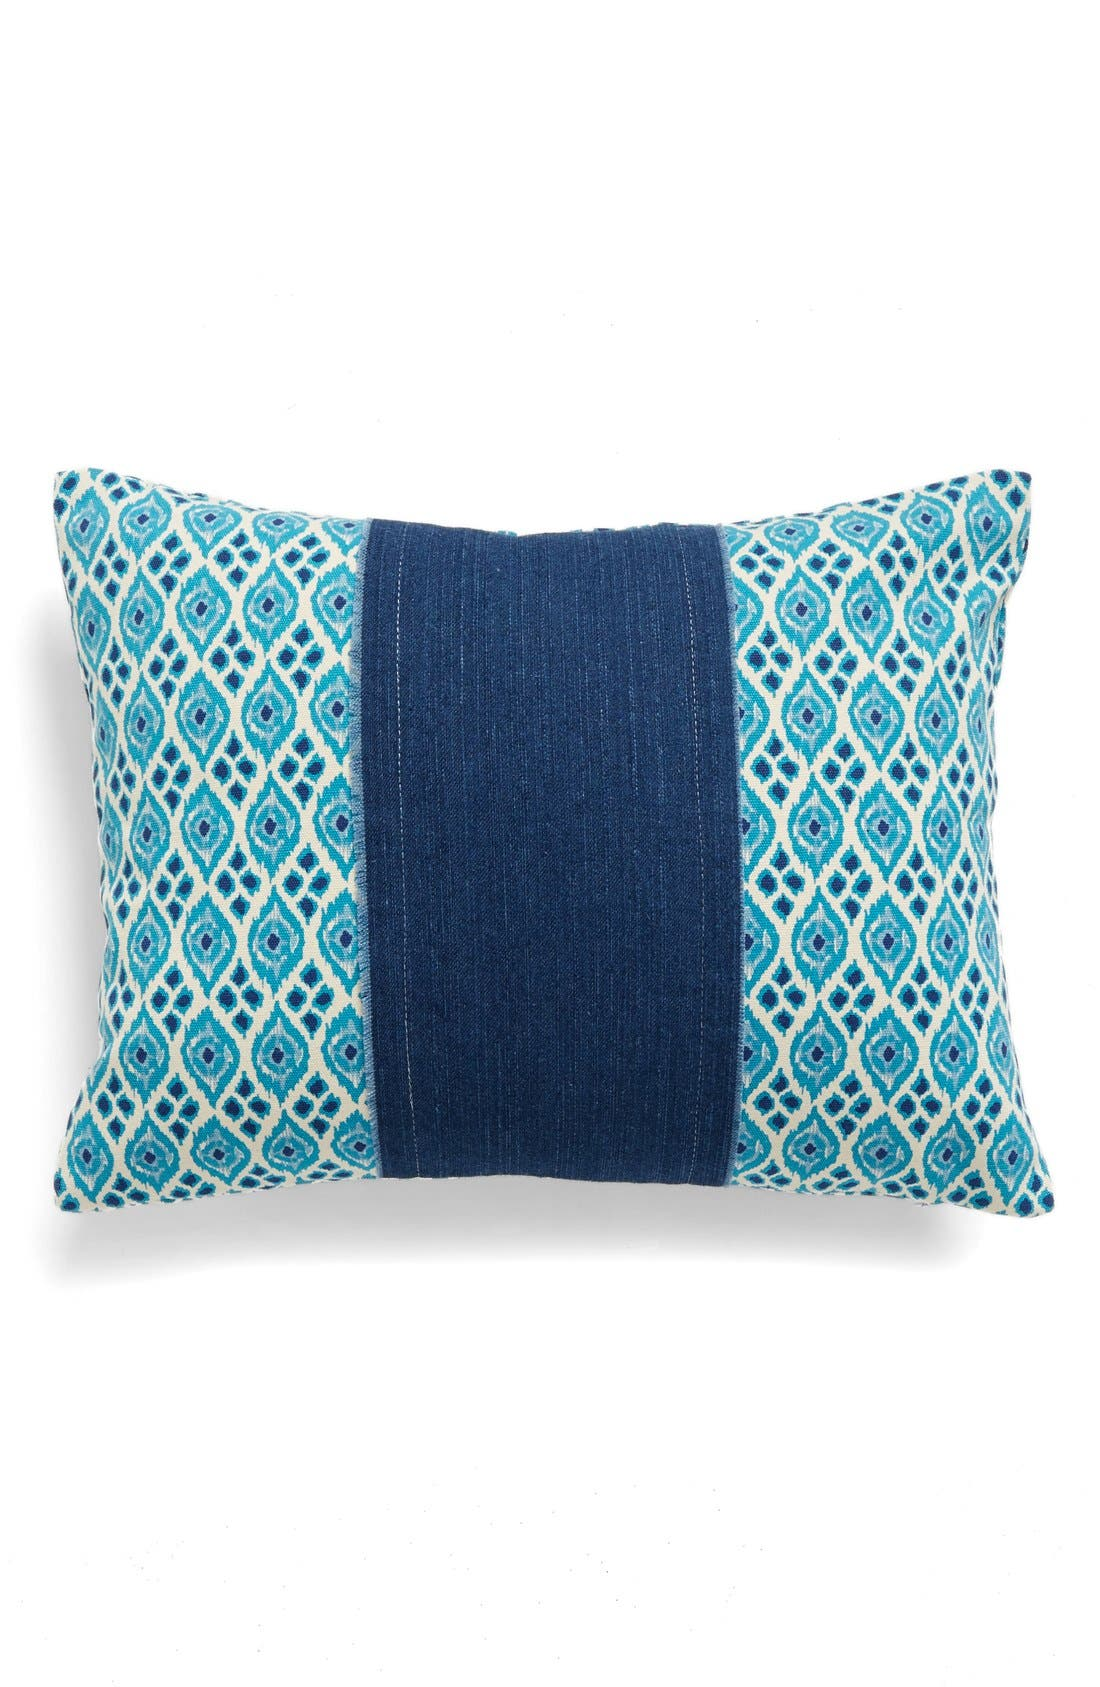 LEVTEX Raw Edge Denim Accent Pillow